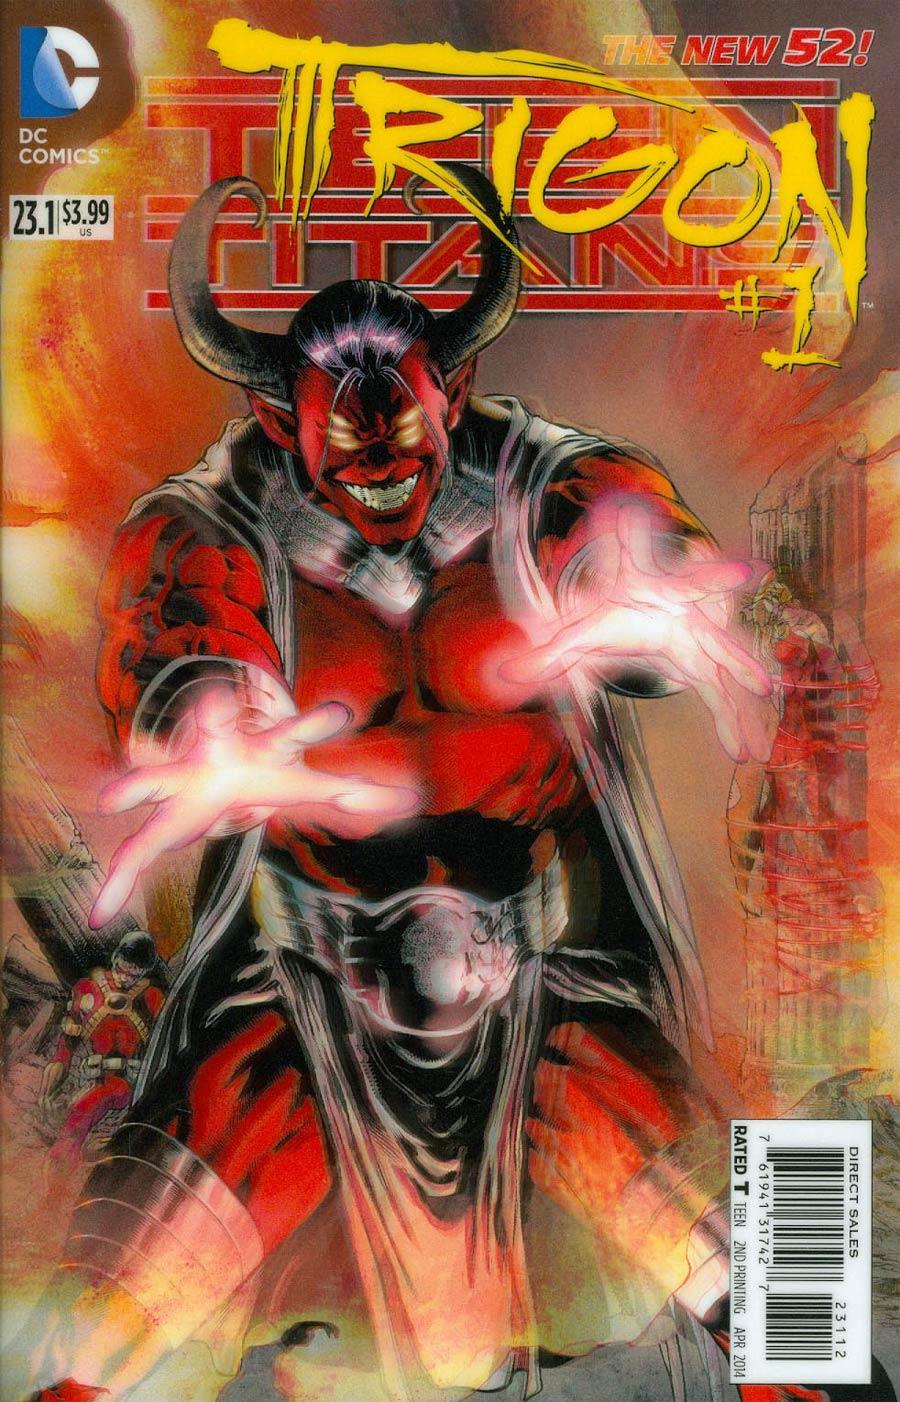 Teen Titans Vol 4 #23.1 Trigon Cover C 2nd Ptg 3D Motion Cover